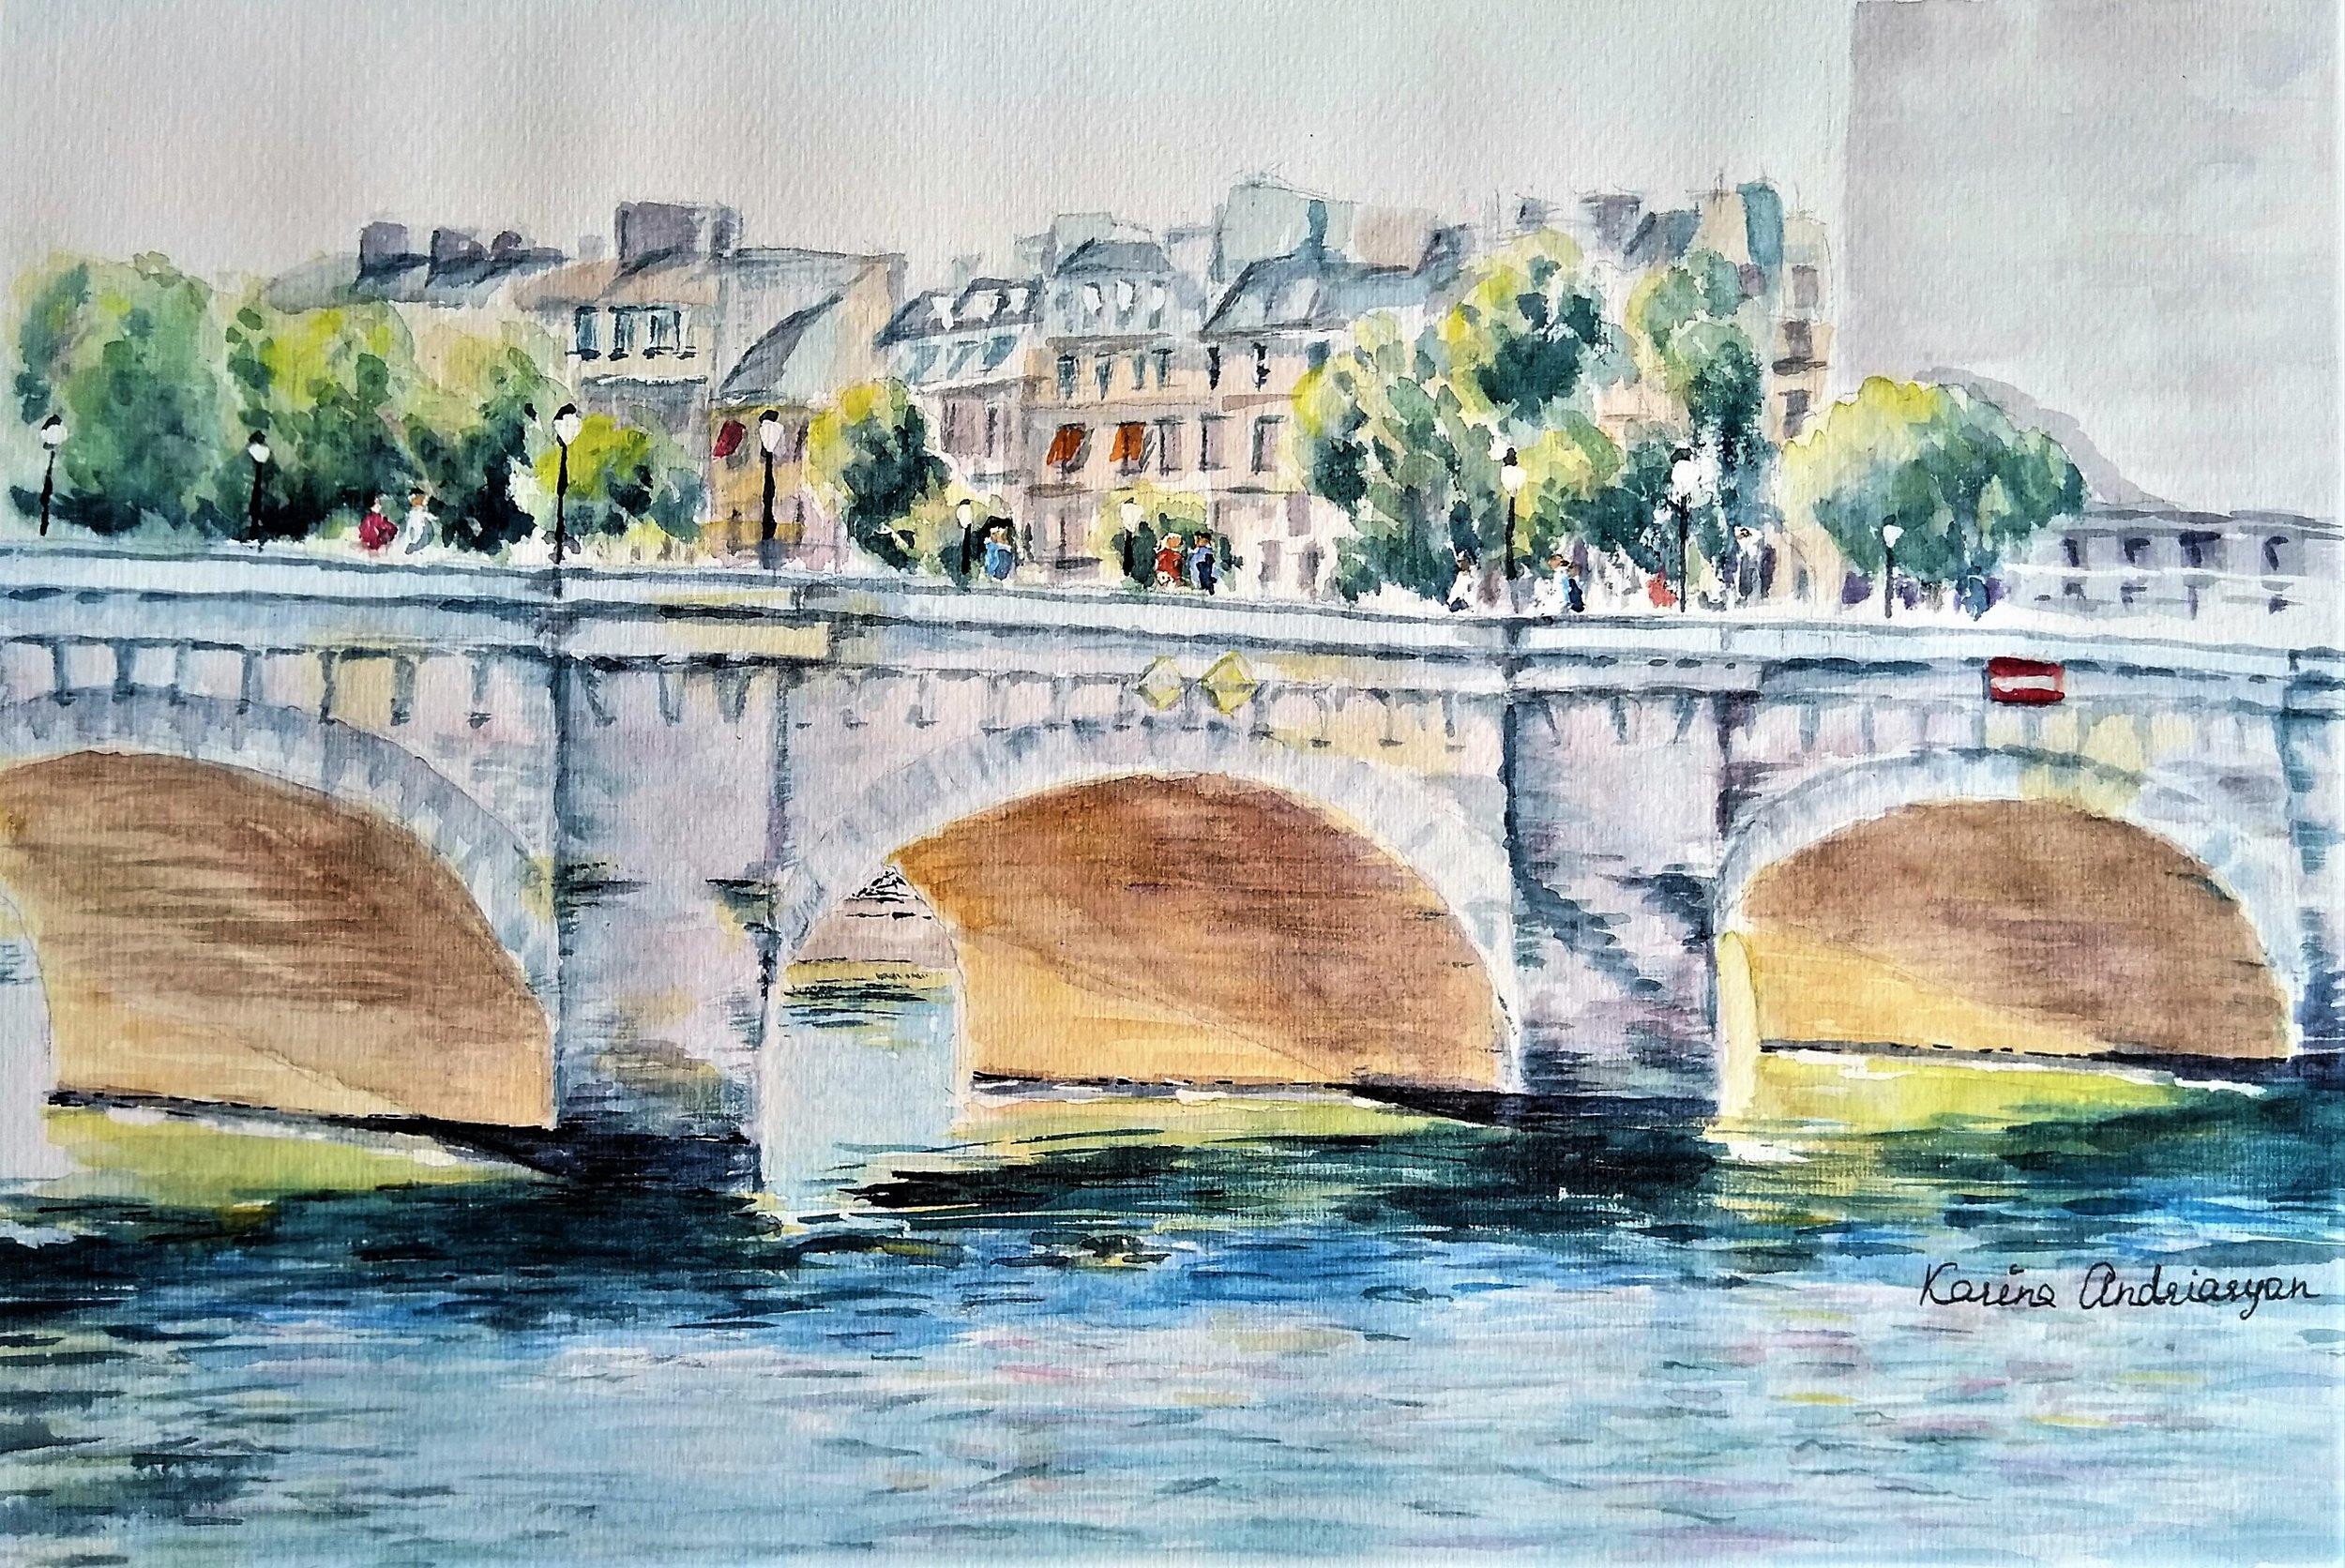 Pont-Neuf-Paris-watercolor-Karine Andriasyan